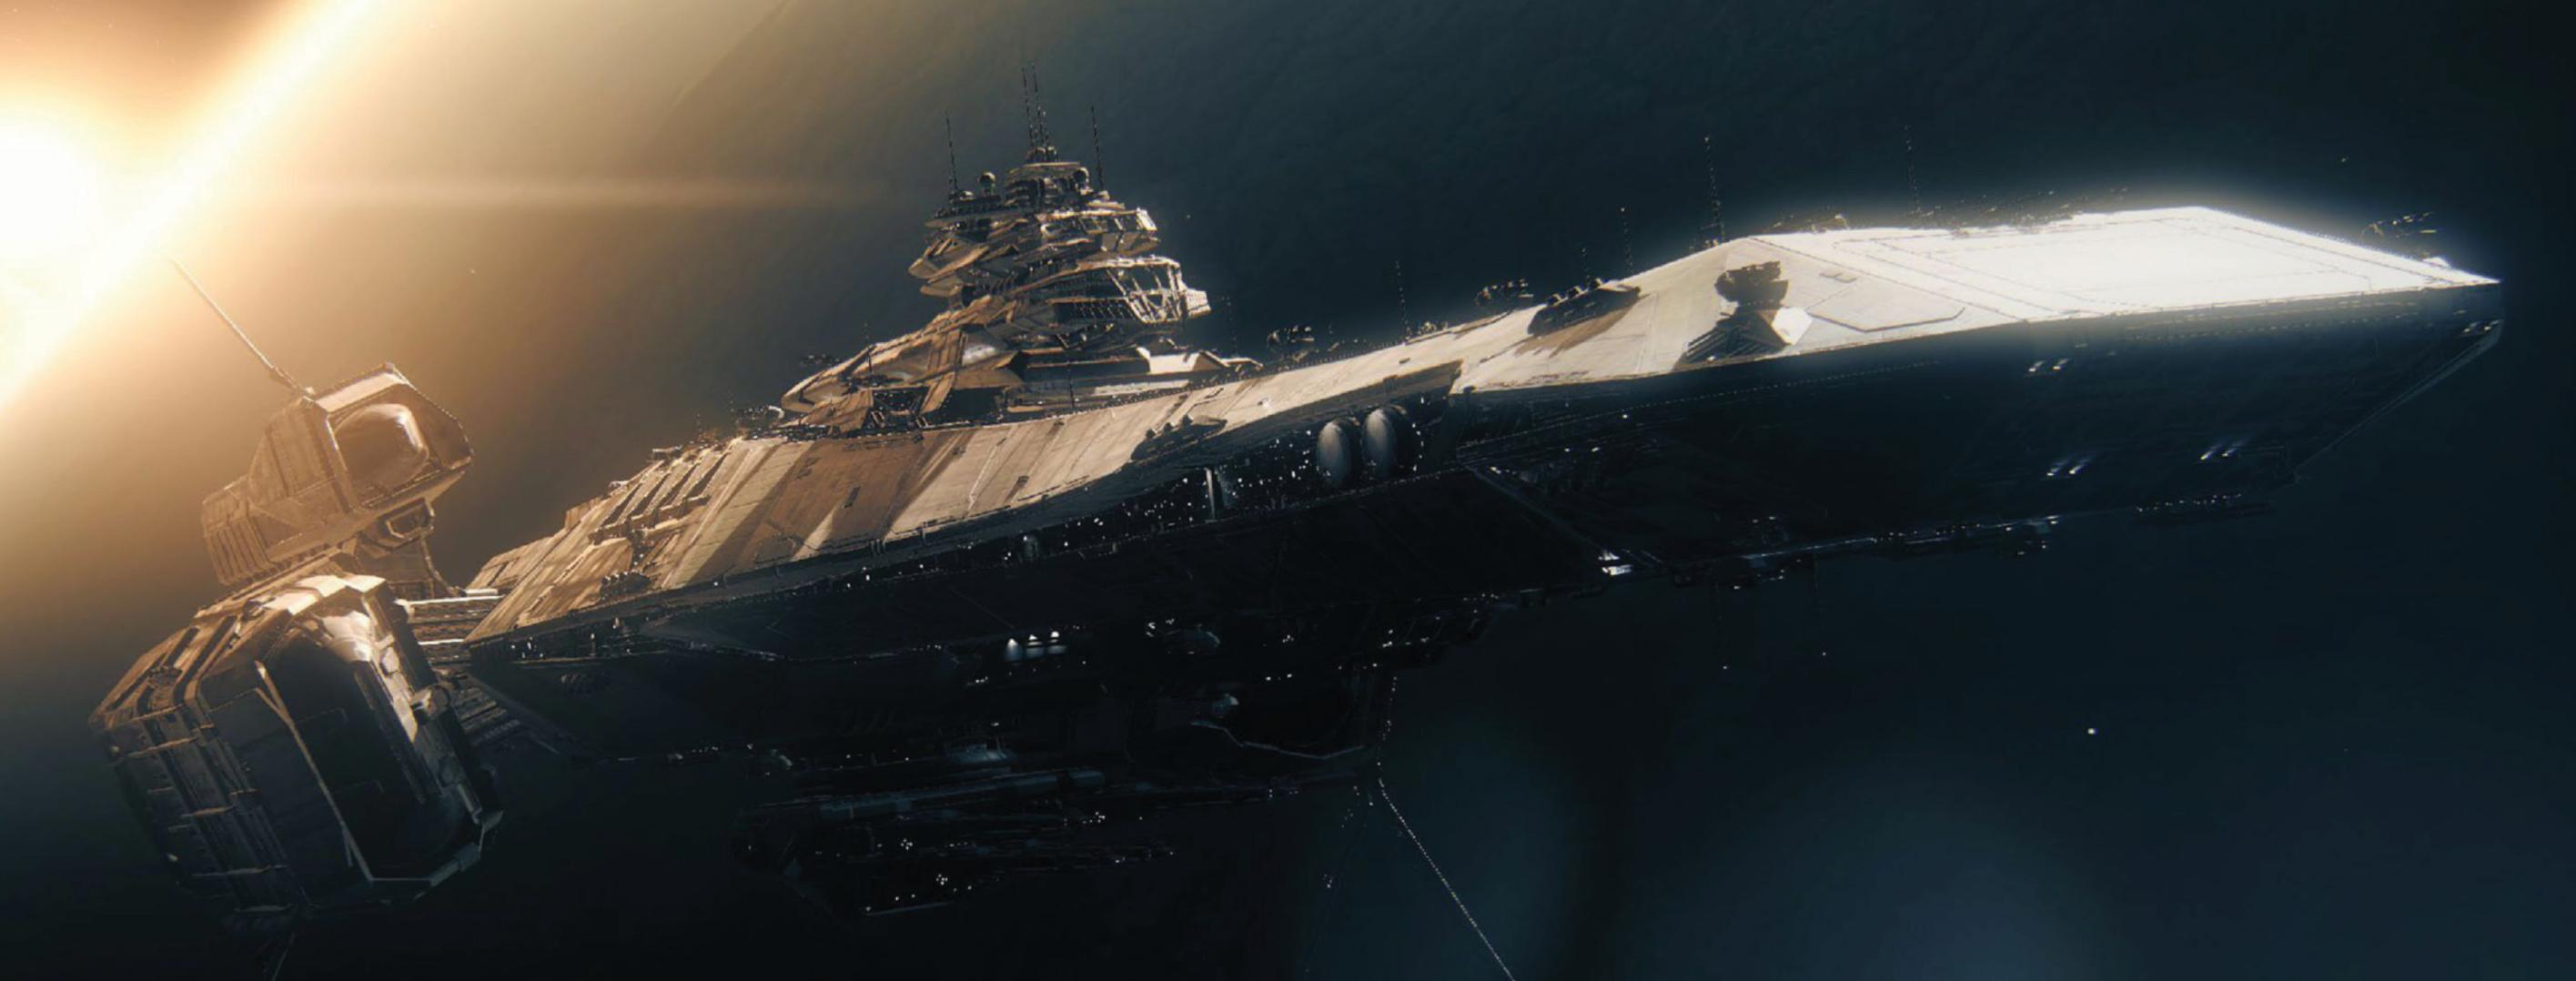 Atlantis-class light cruiser